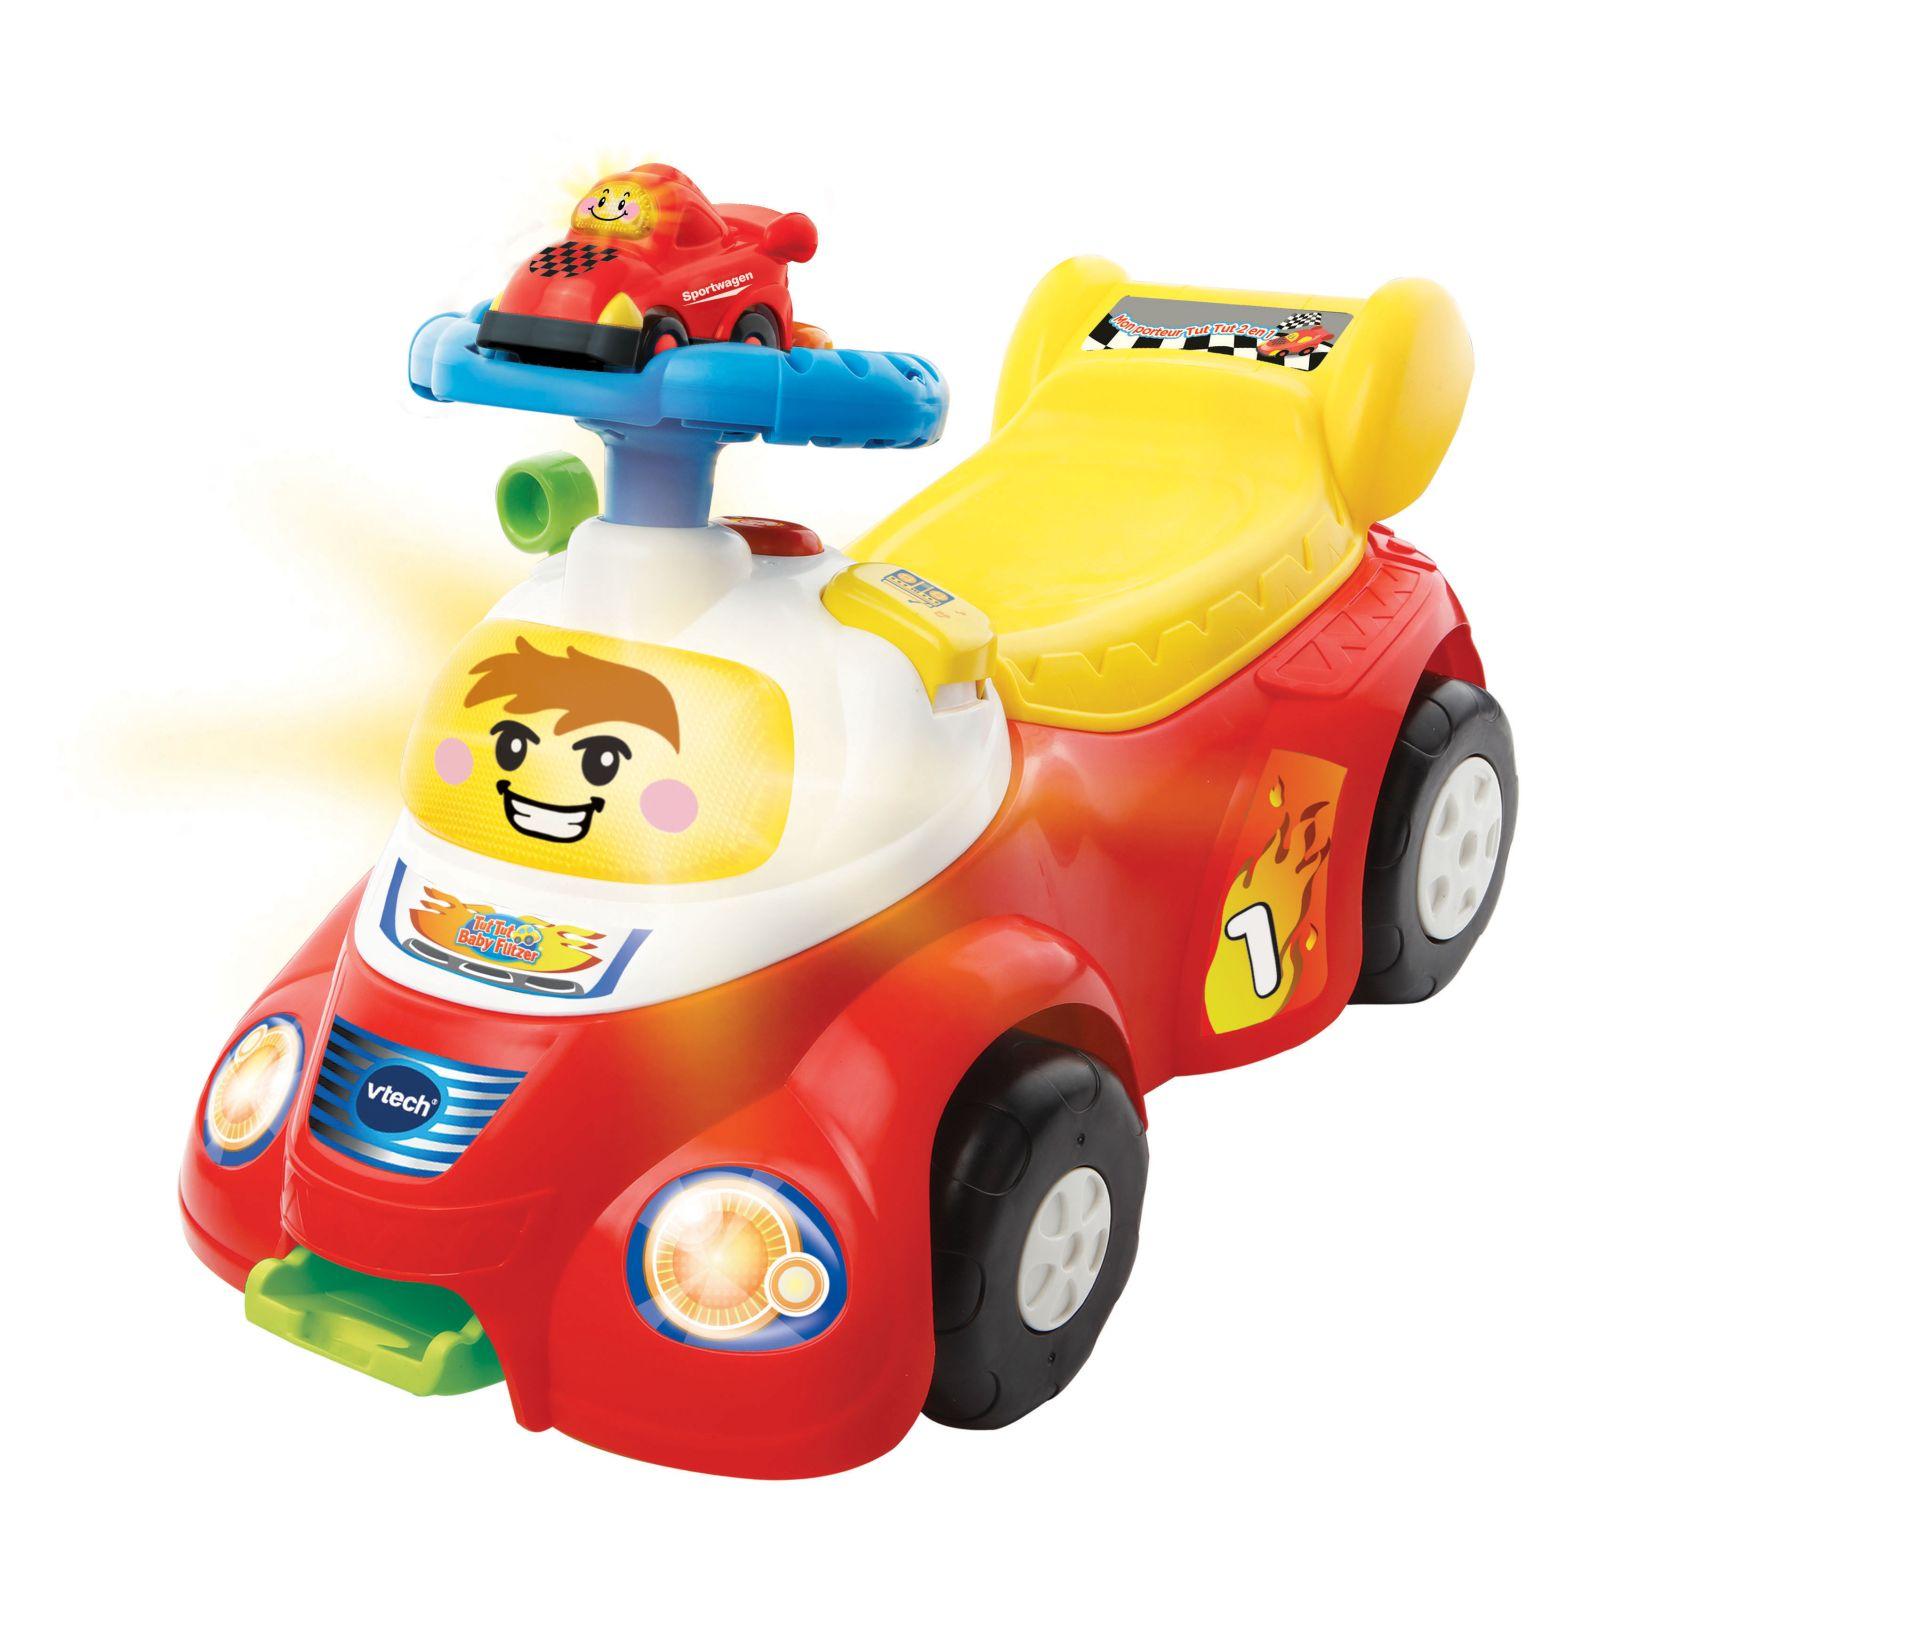 vtech tut tut baby flitzer rutschauto 2 in 1 g nstig. Black Bedroom Furniture Sets. Home Design Ideas